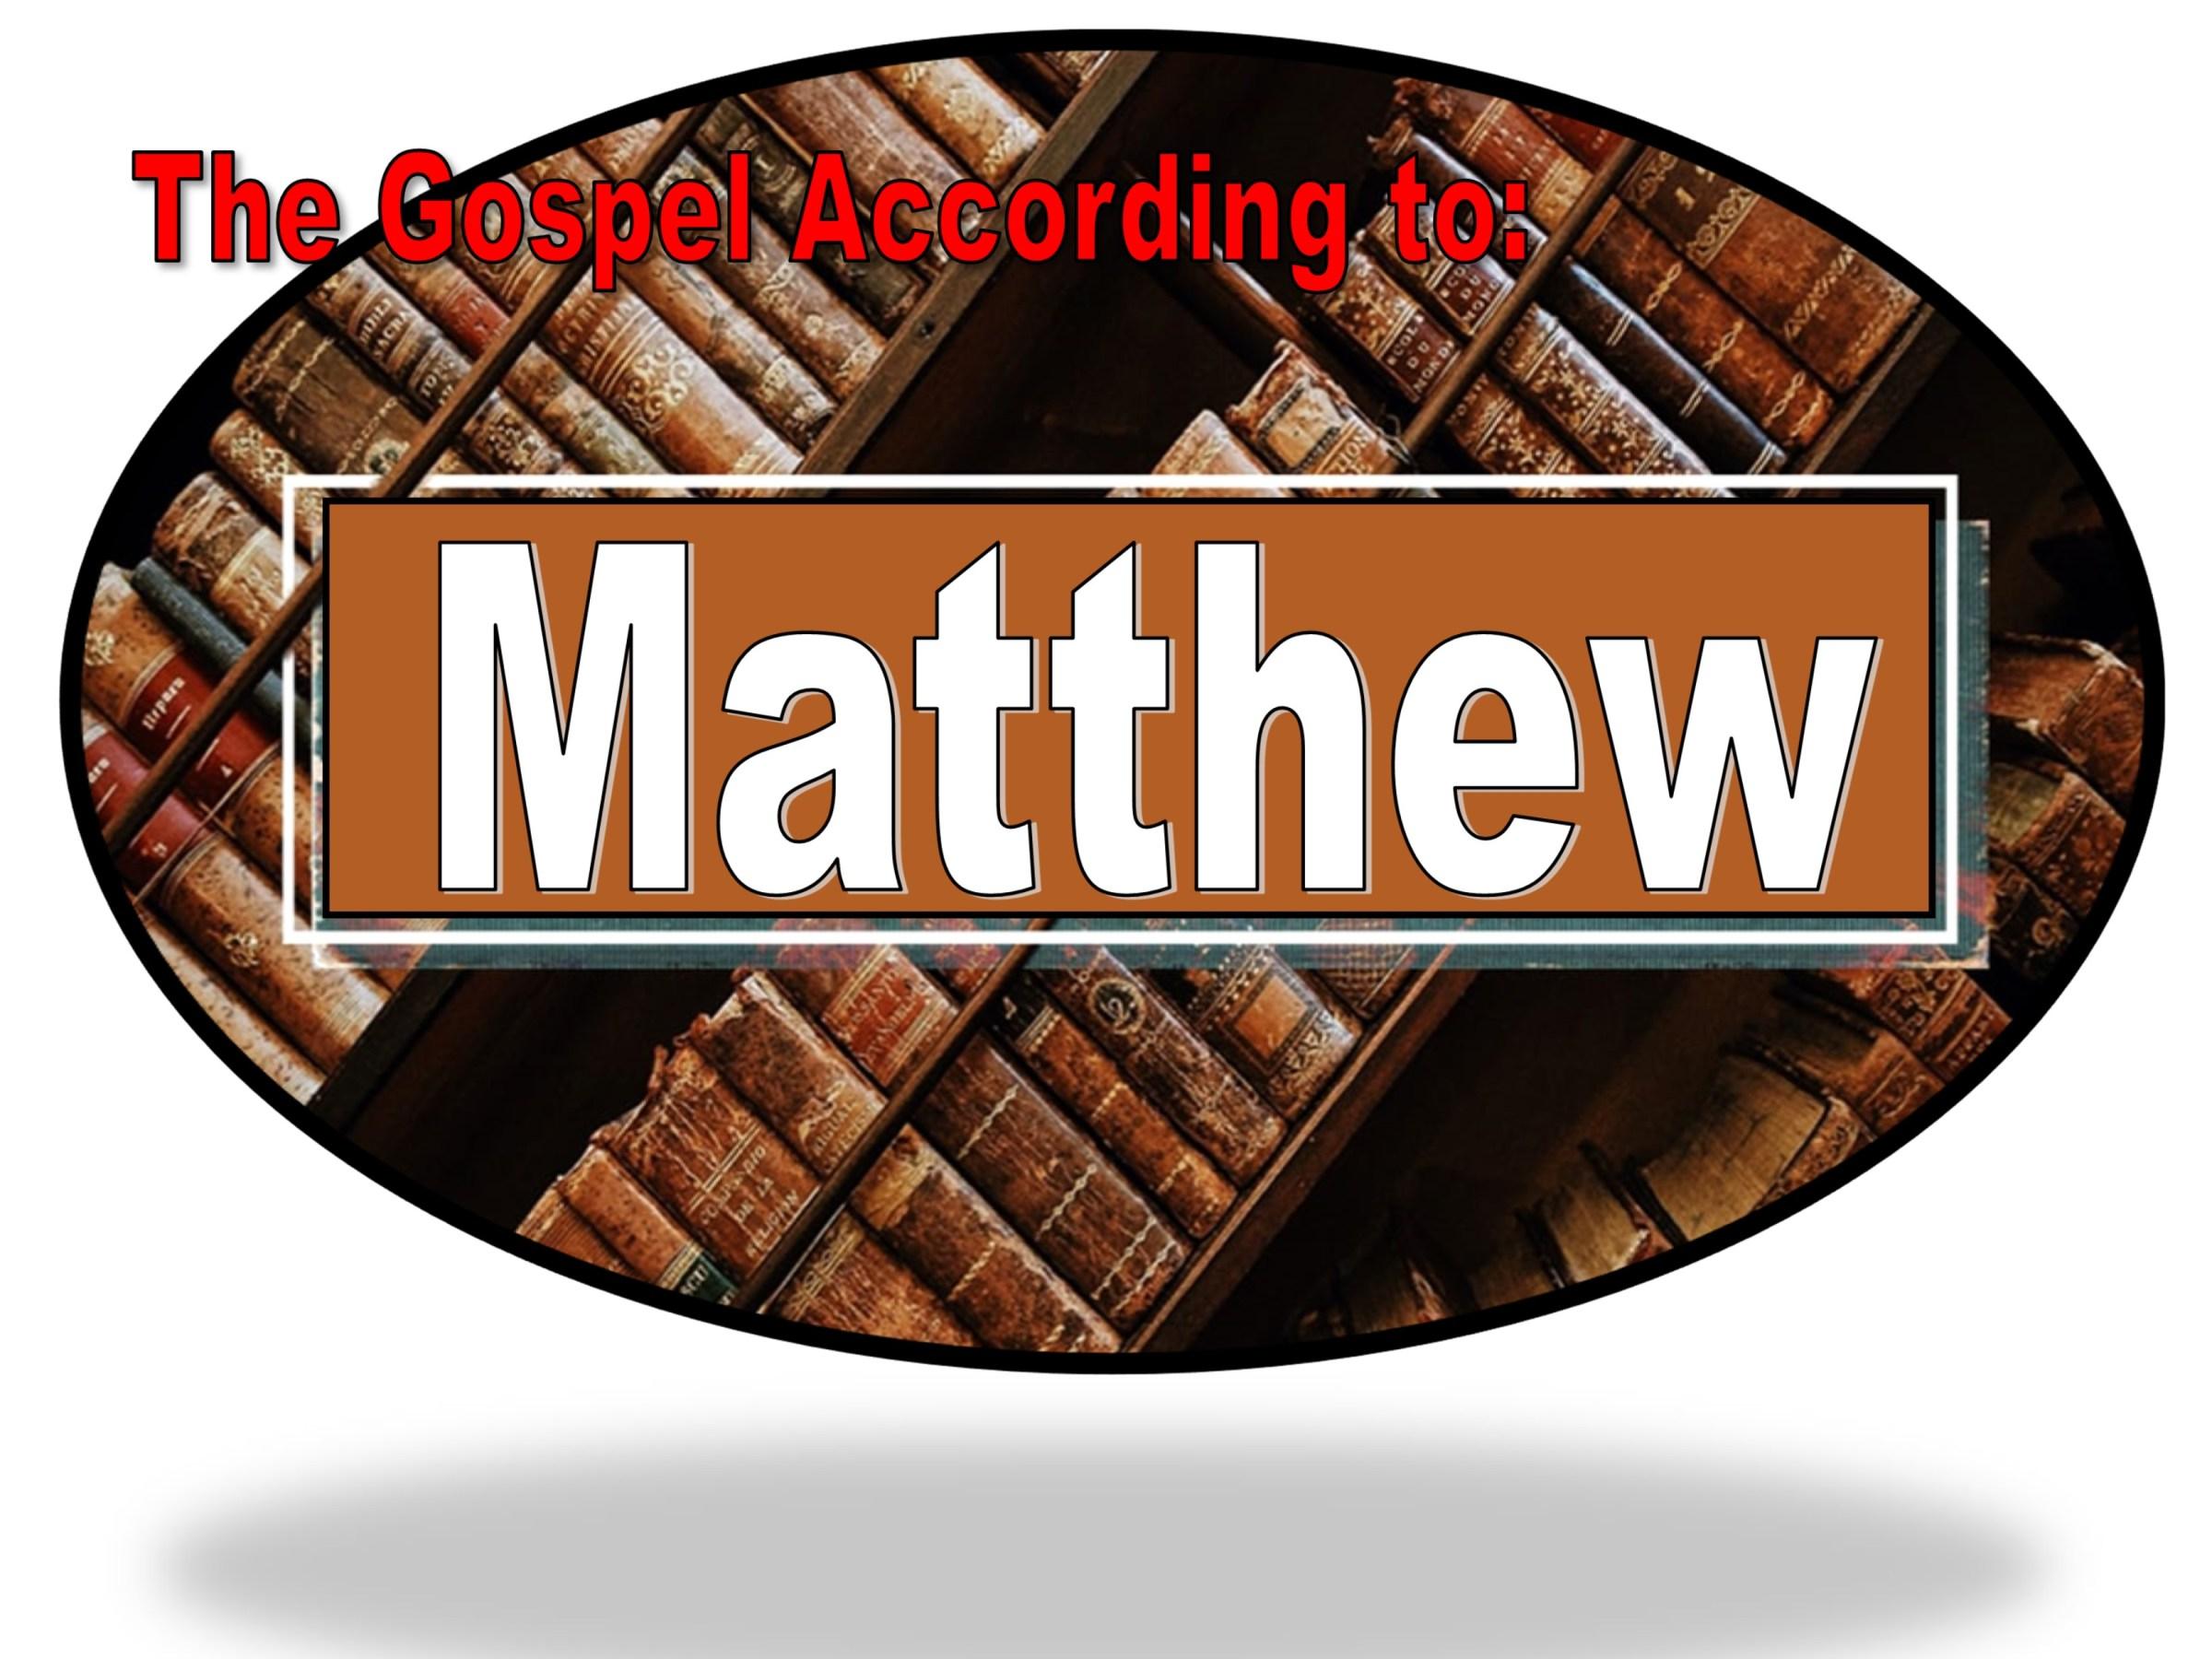 Book of Matthew feature at Randomnestfamily.org